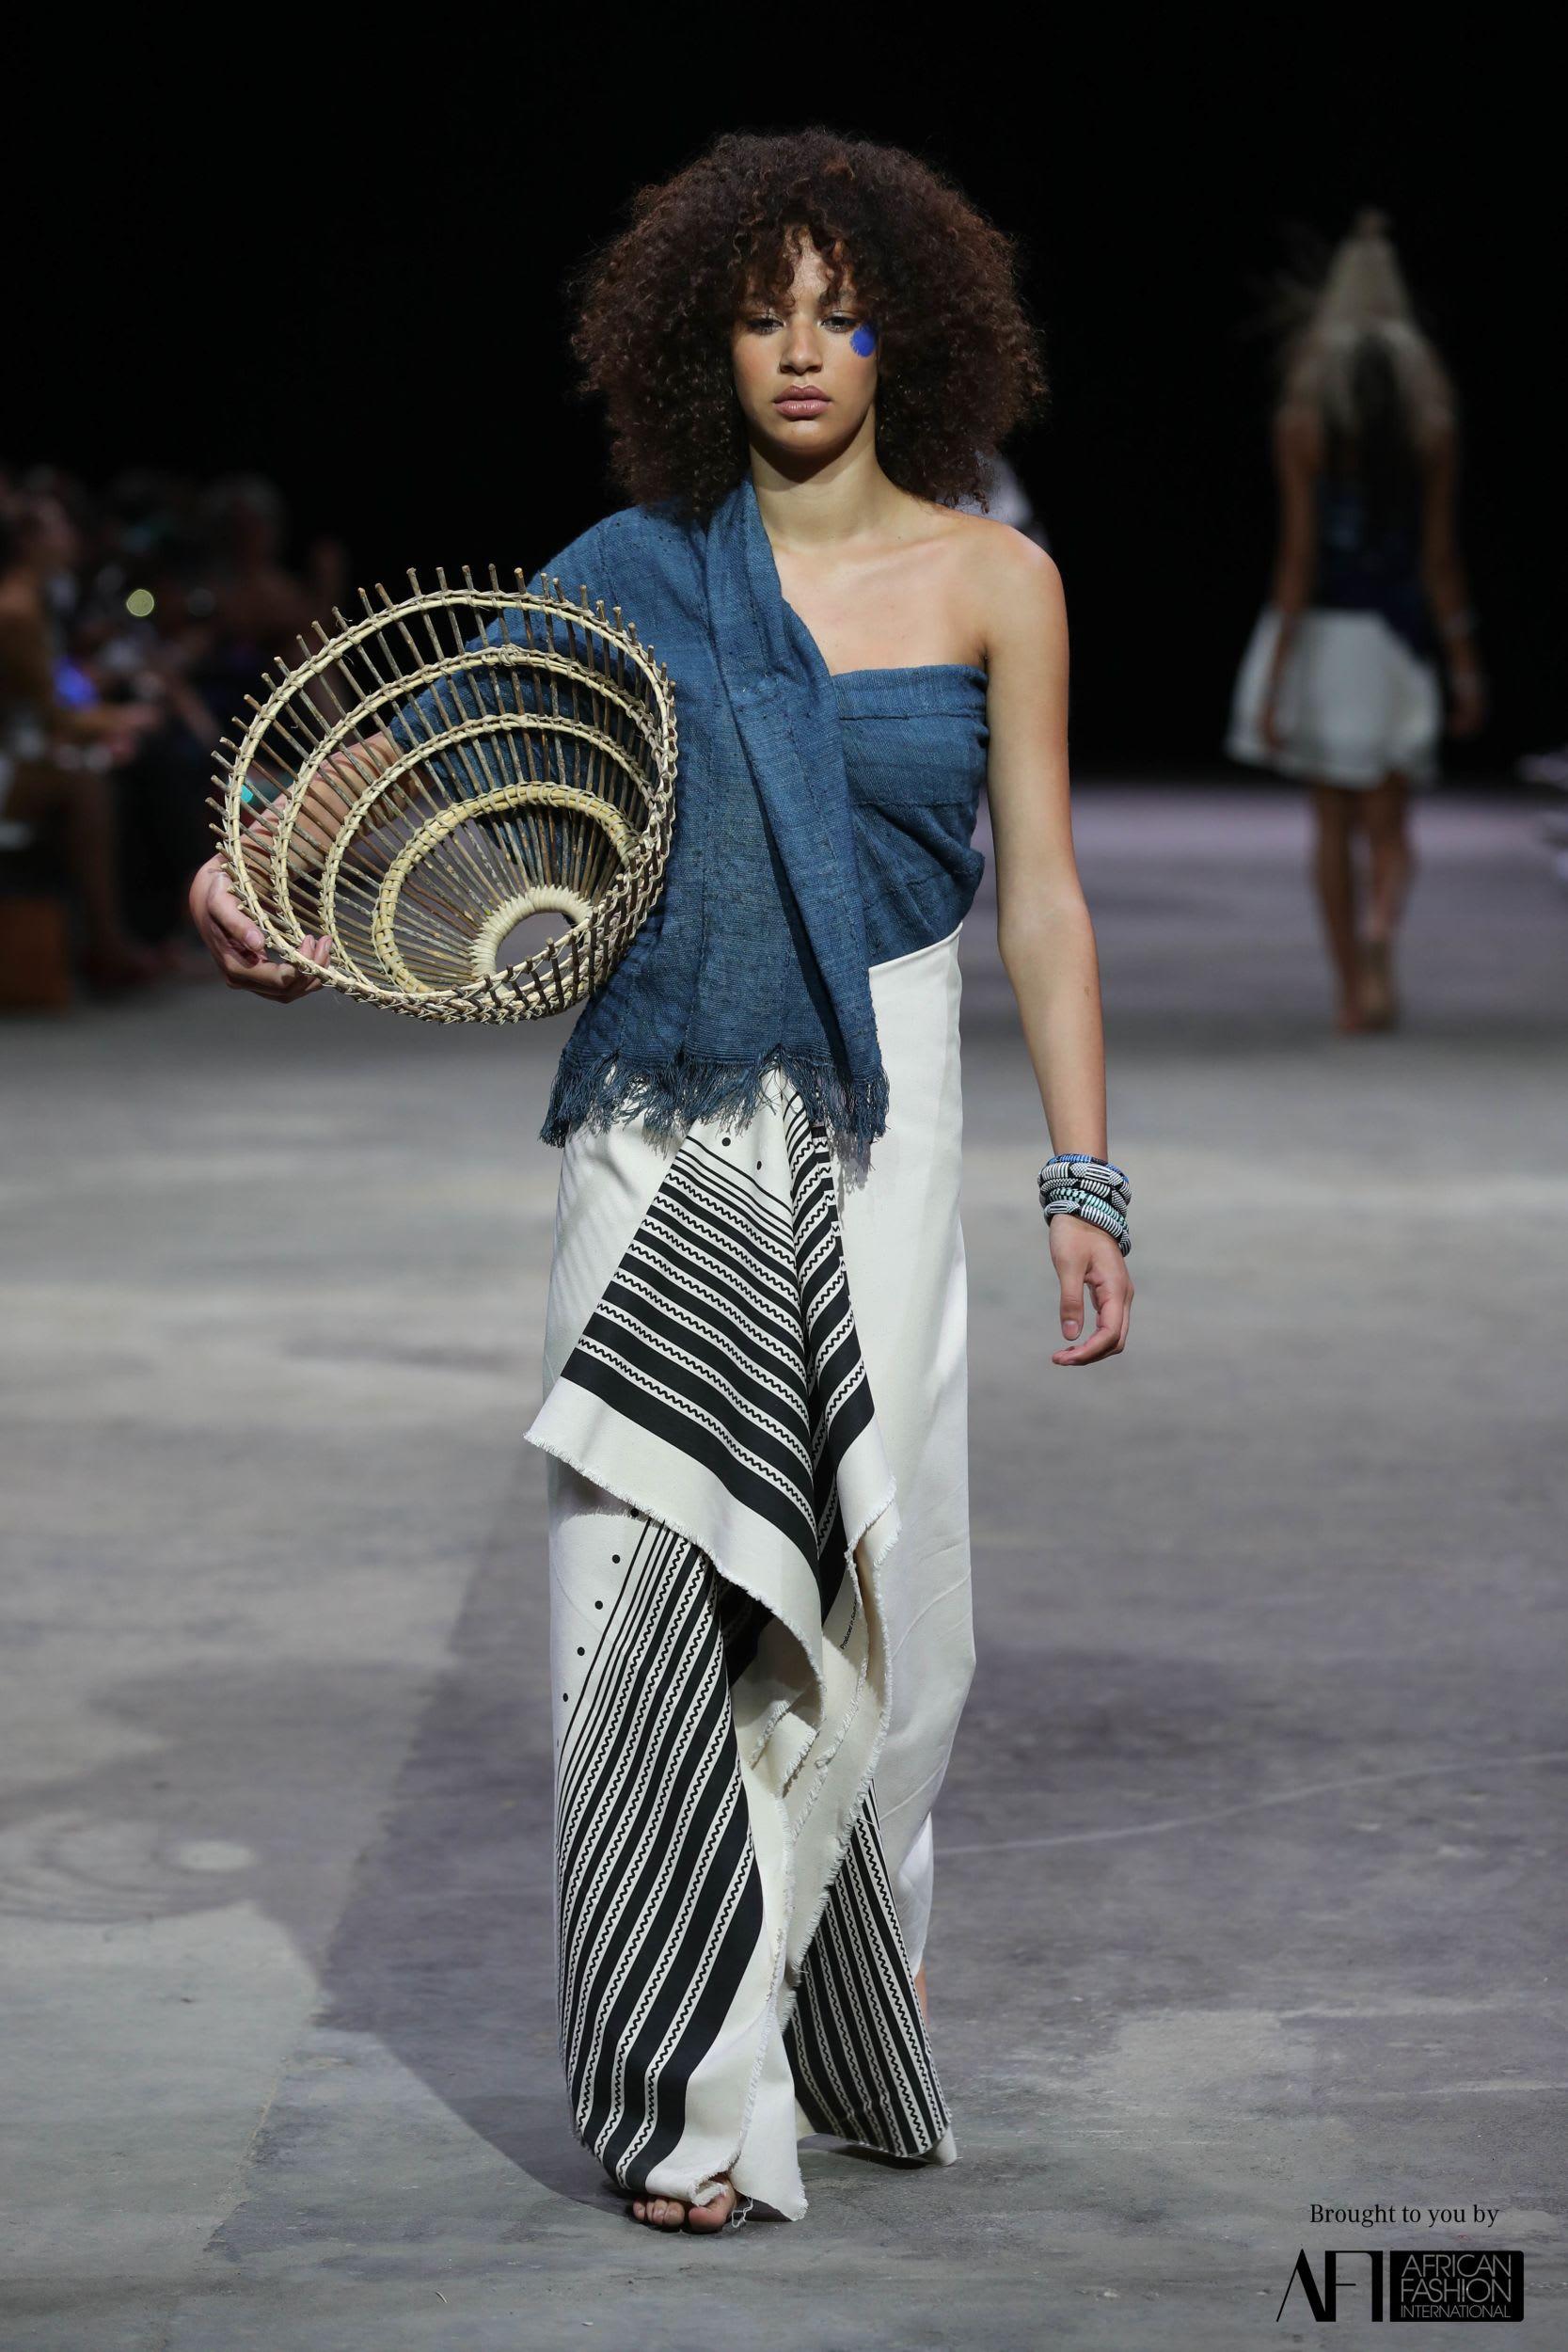 #AFICTFW18 | Fashion Revolution